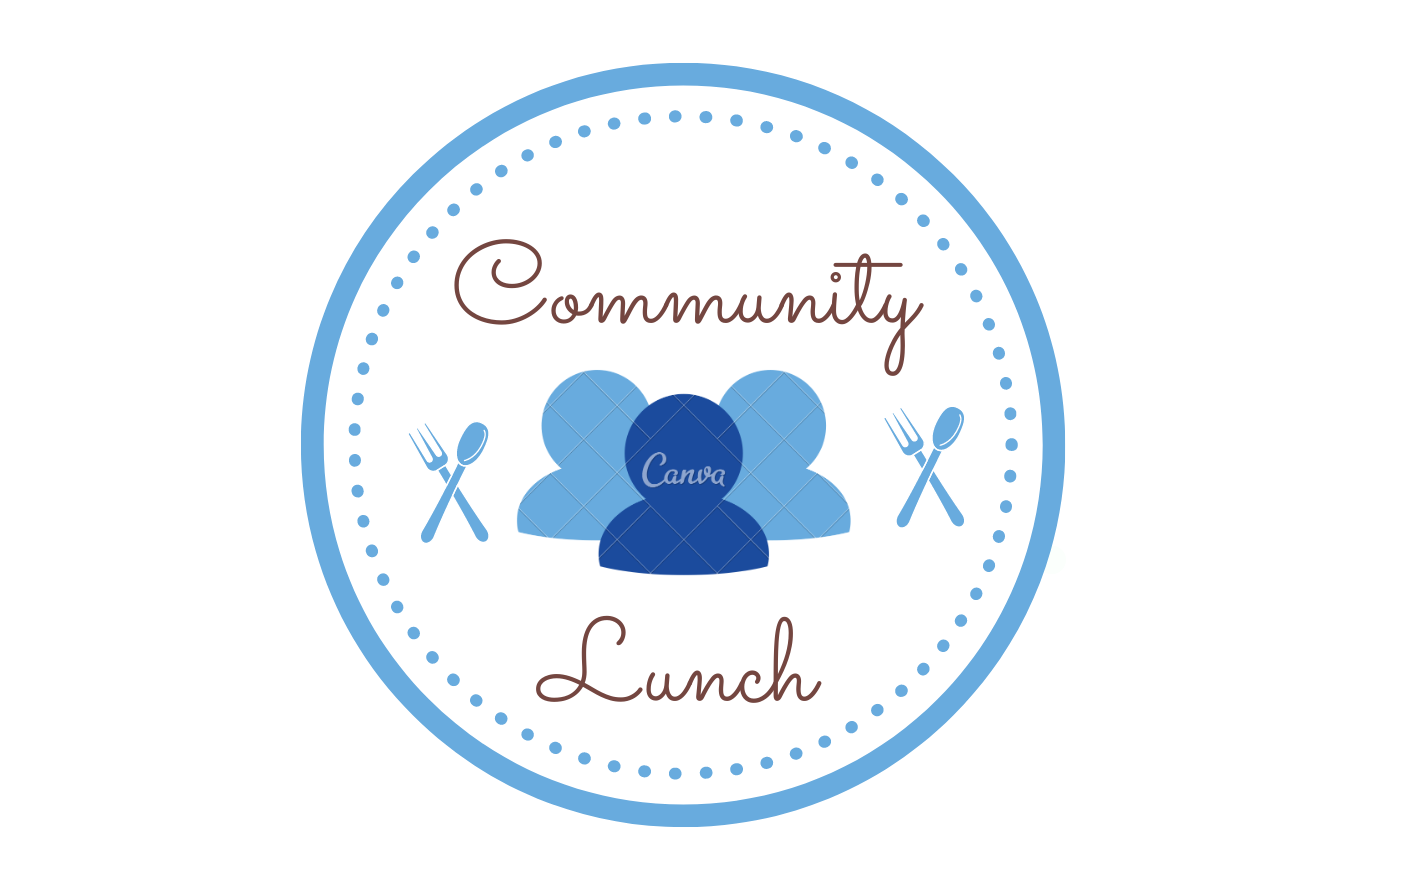 Haslingen Community Link – Community Lunch